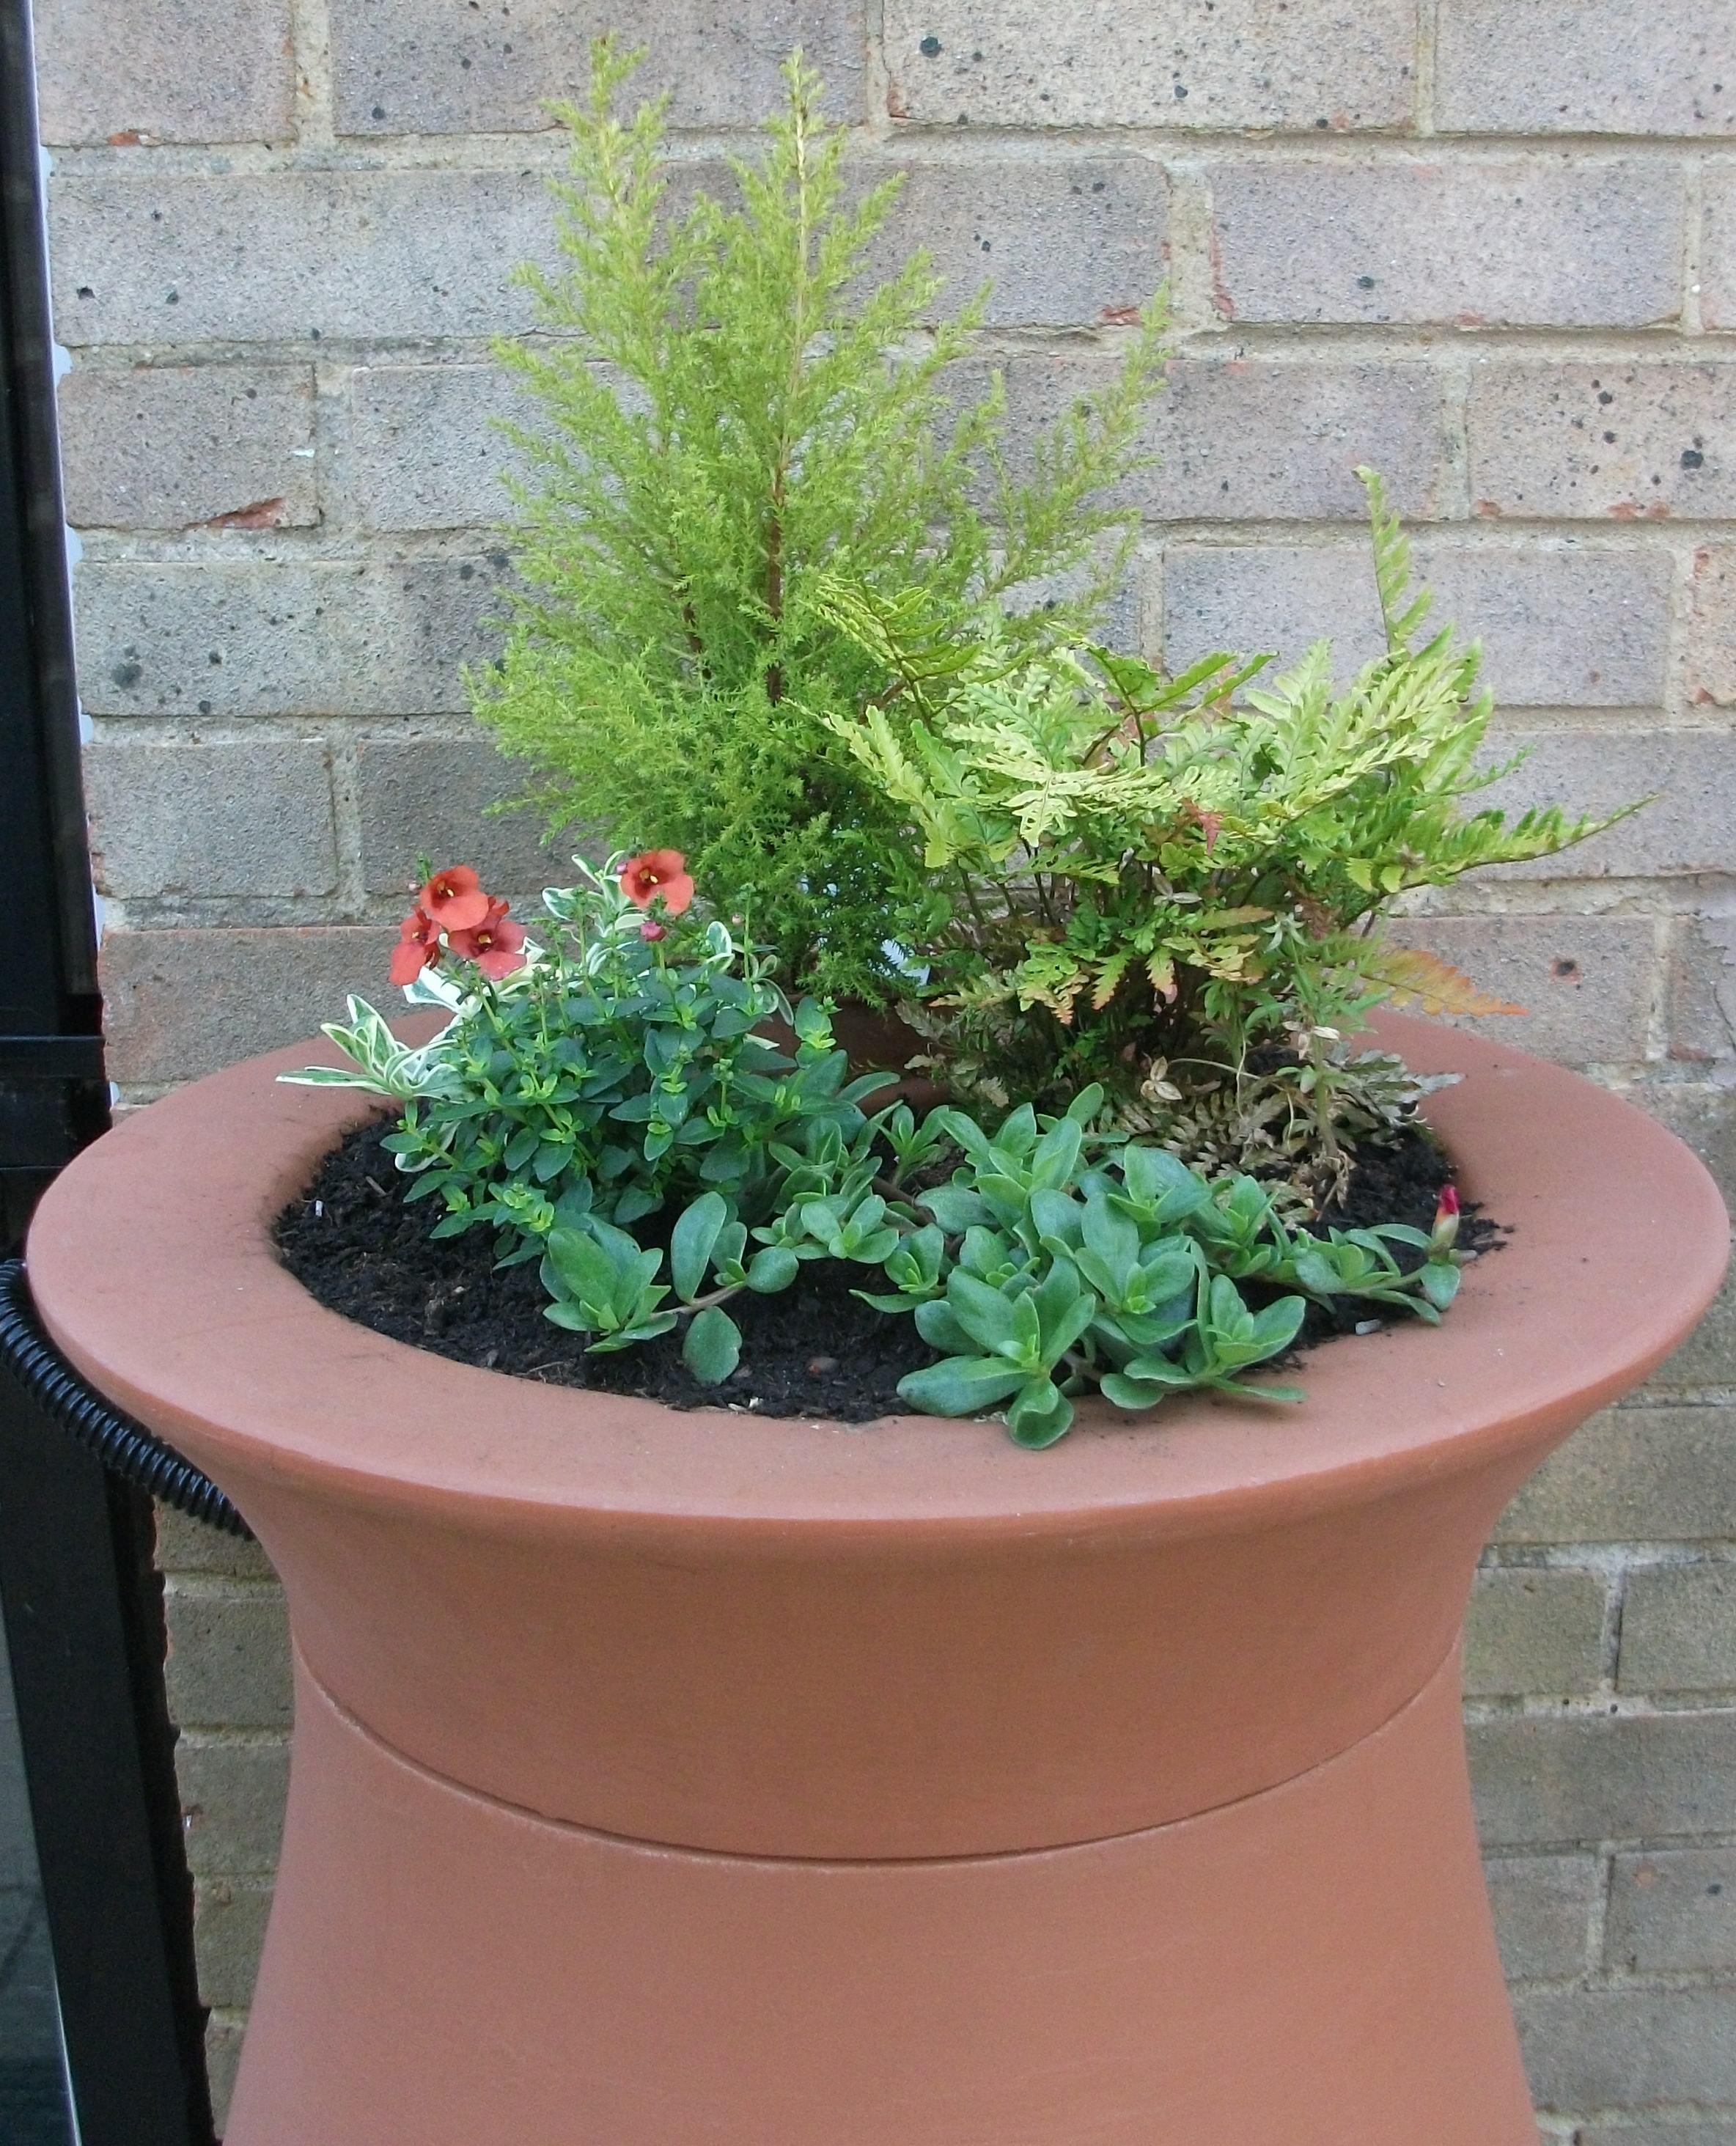 Garden water barrel with flowers on it's lid